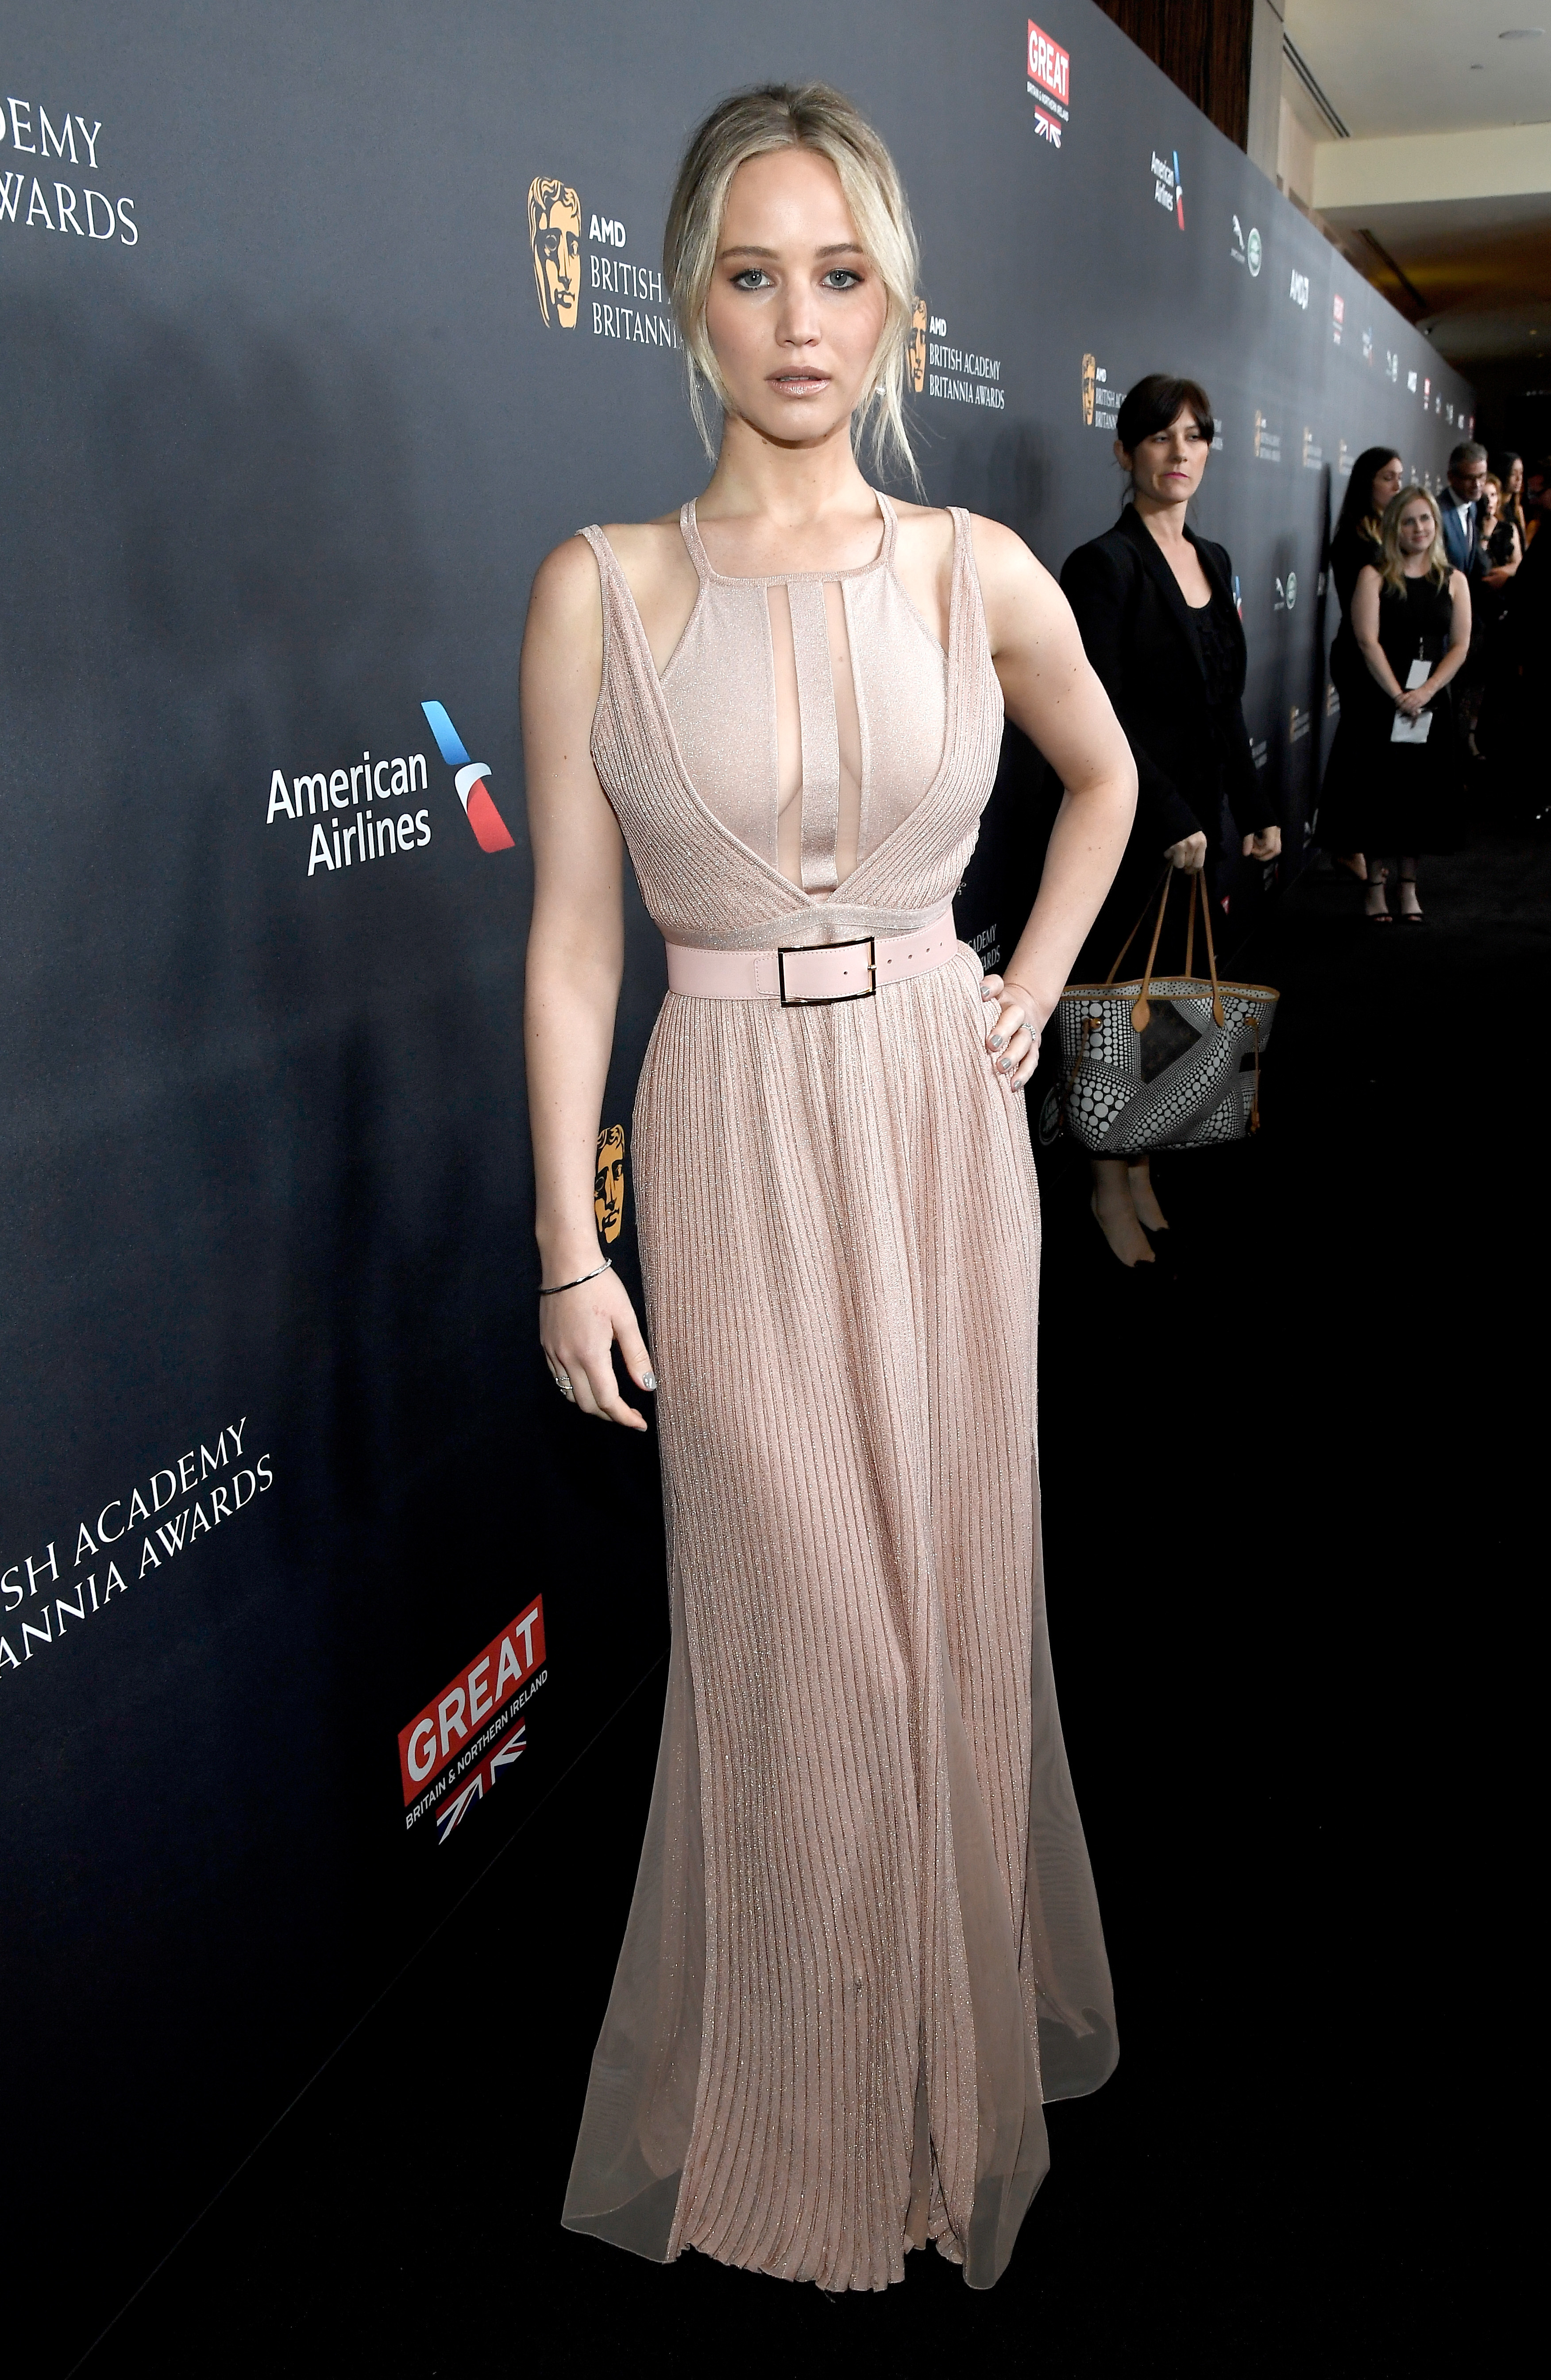 Jennifer Lawrence calls her new boyfriend Darren Aronofsky 'a visionary'